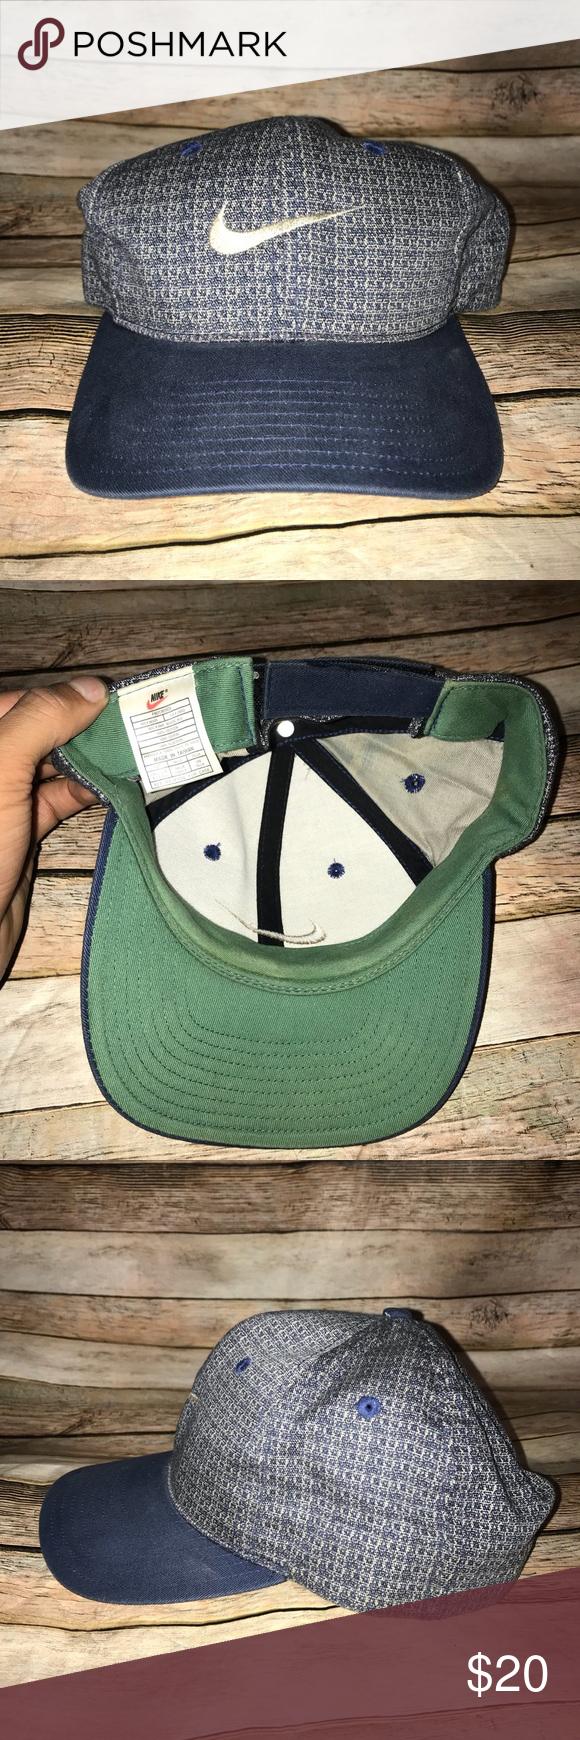 Vintage Nike Golf Hat Vintage Nike Golf Hat Nike Accessories Hats Vintage Nike Nike Golf Hat Nike Golf